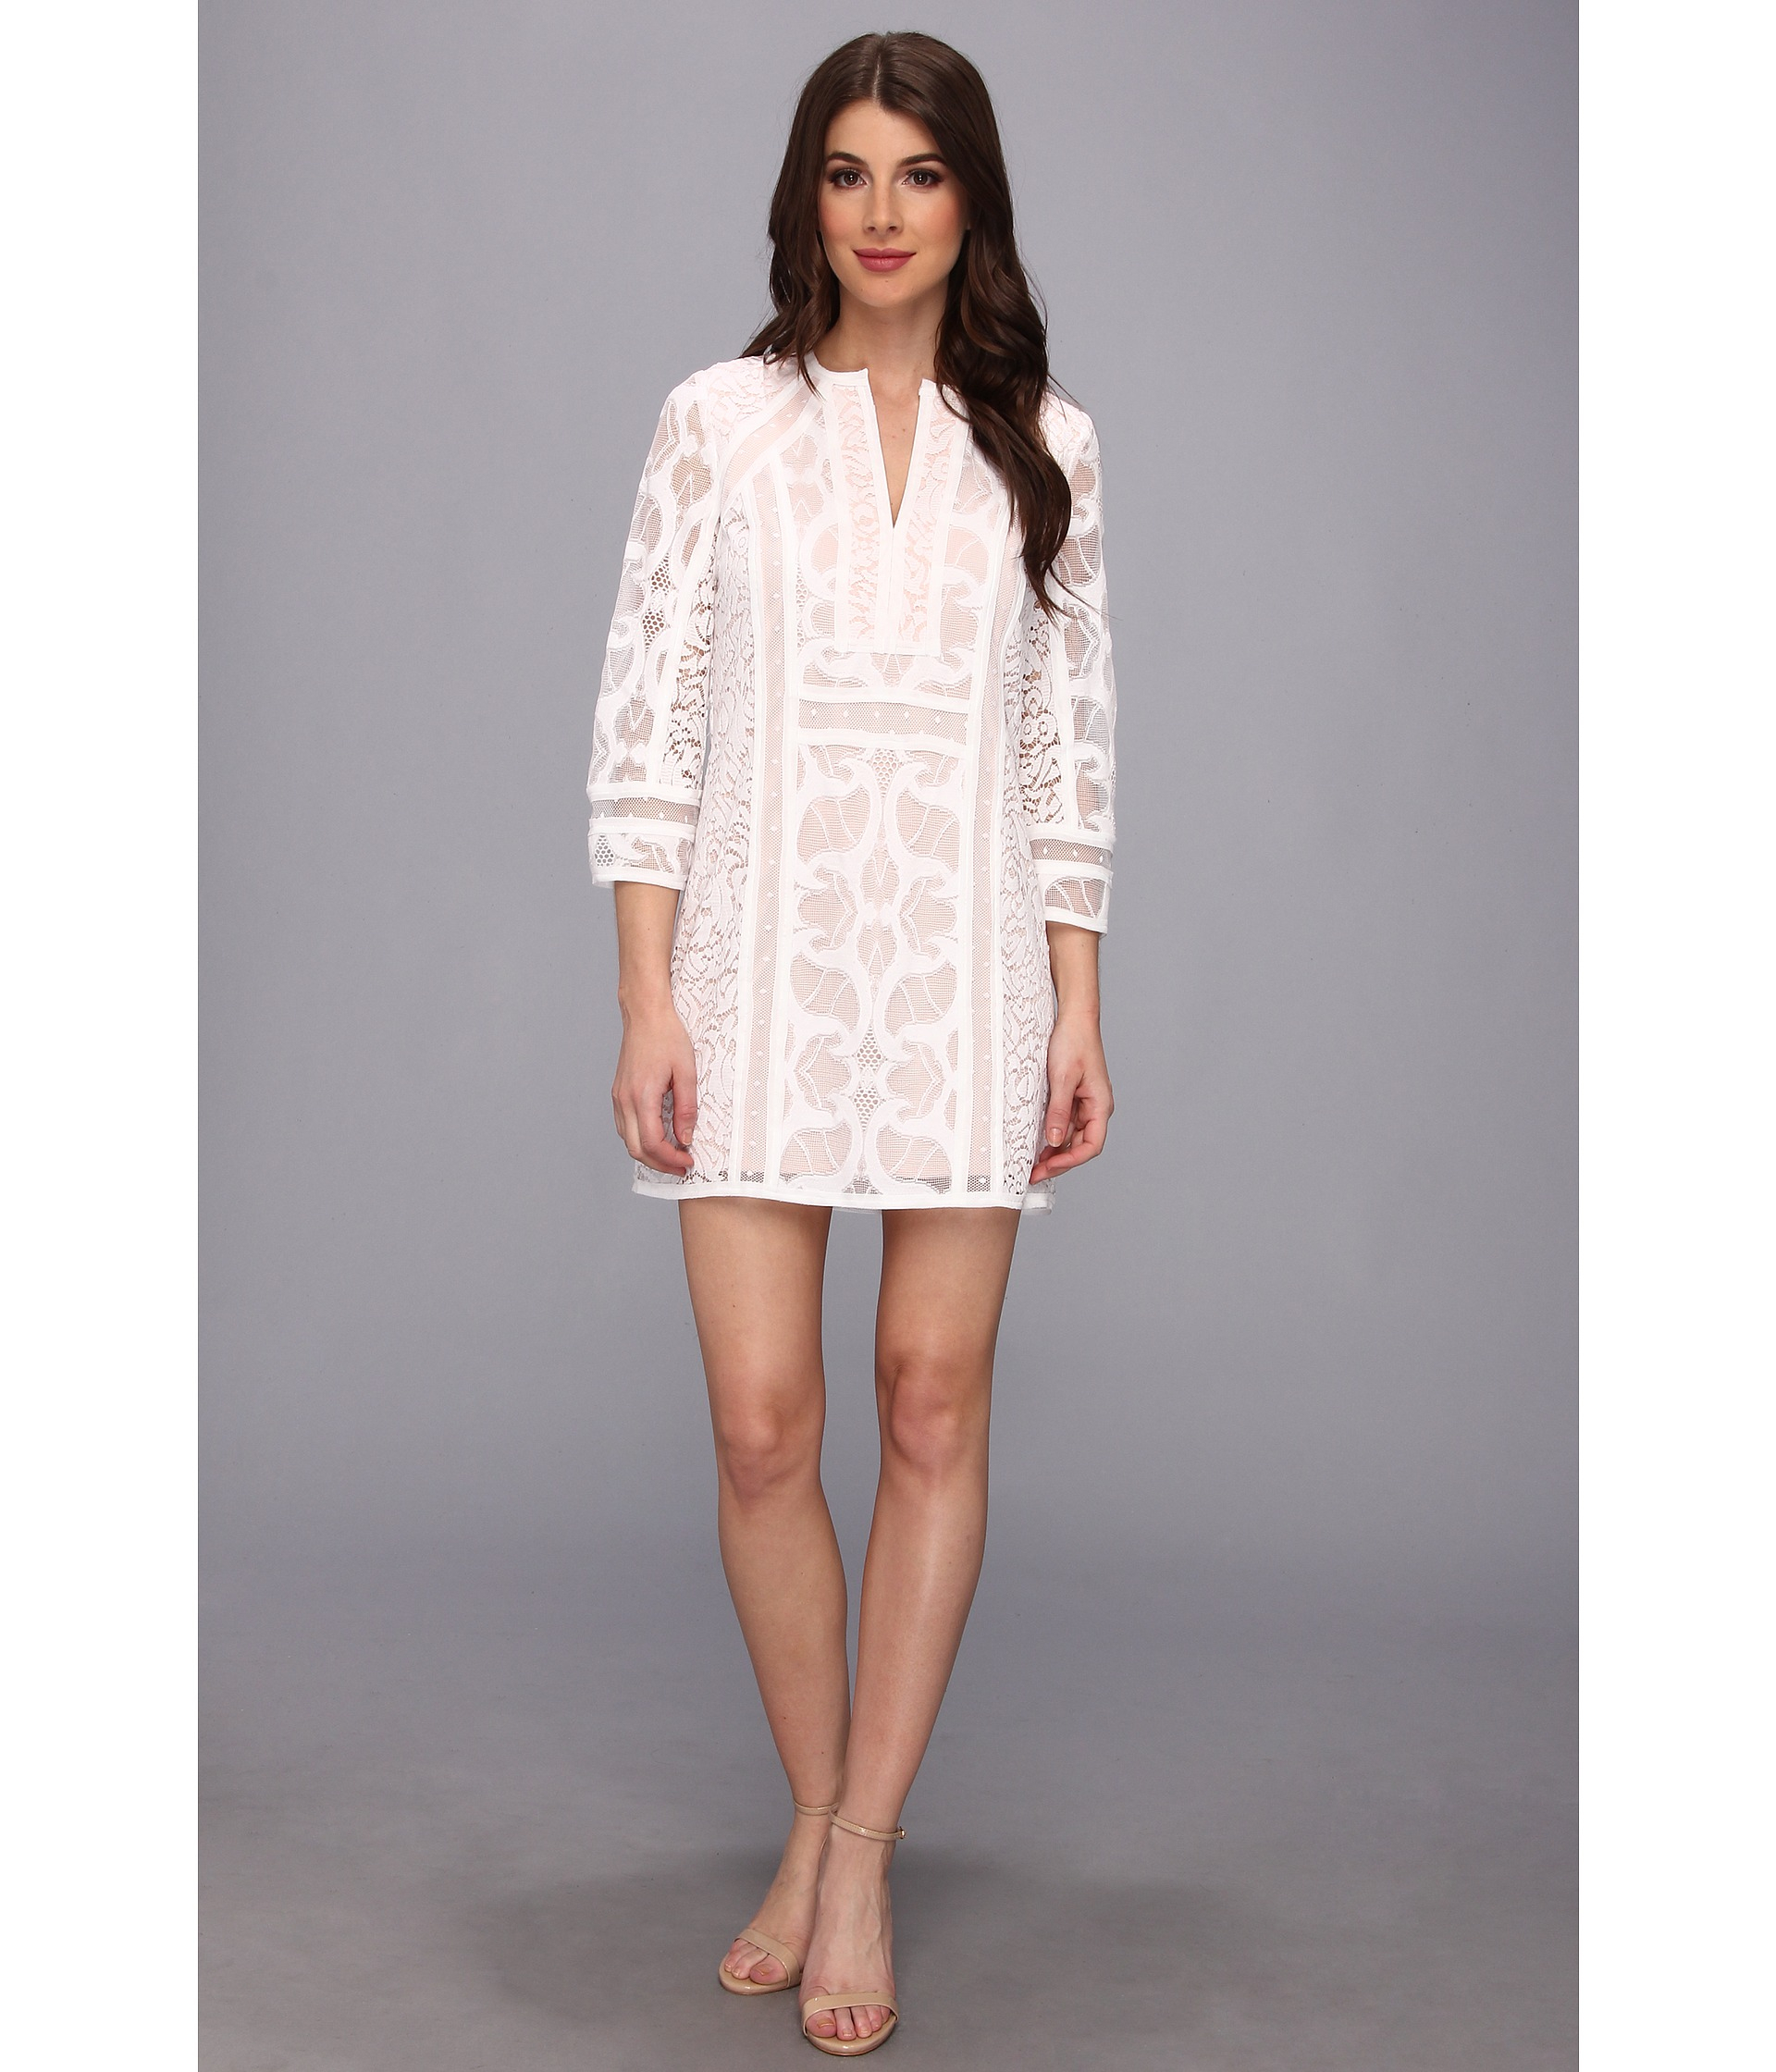 Bcbgmaxazria Nikki Lace Sheath Dress in White | Lyst